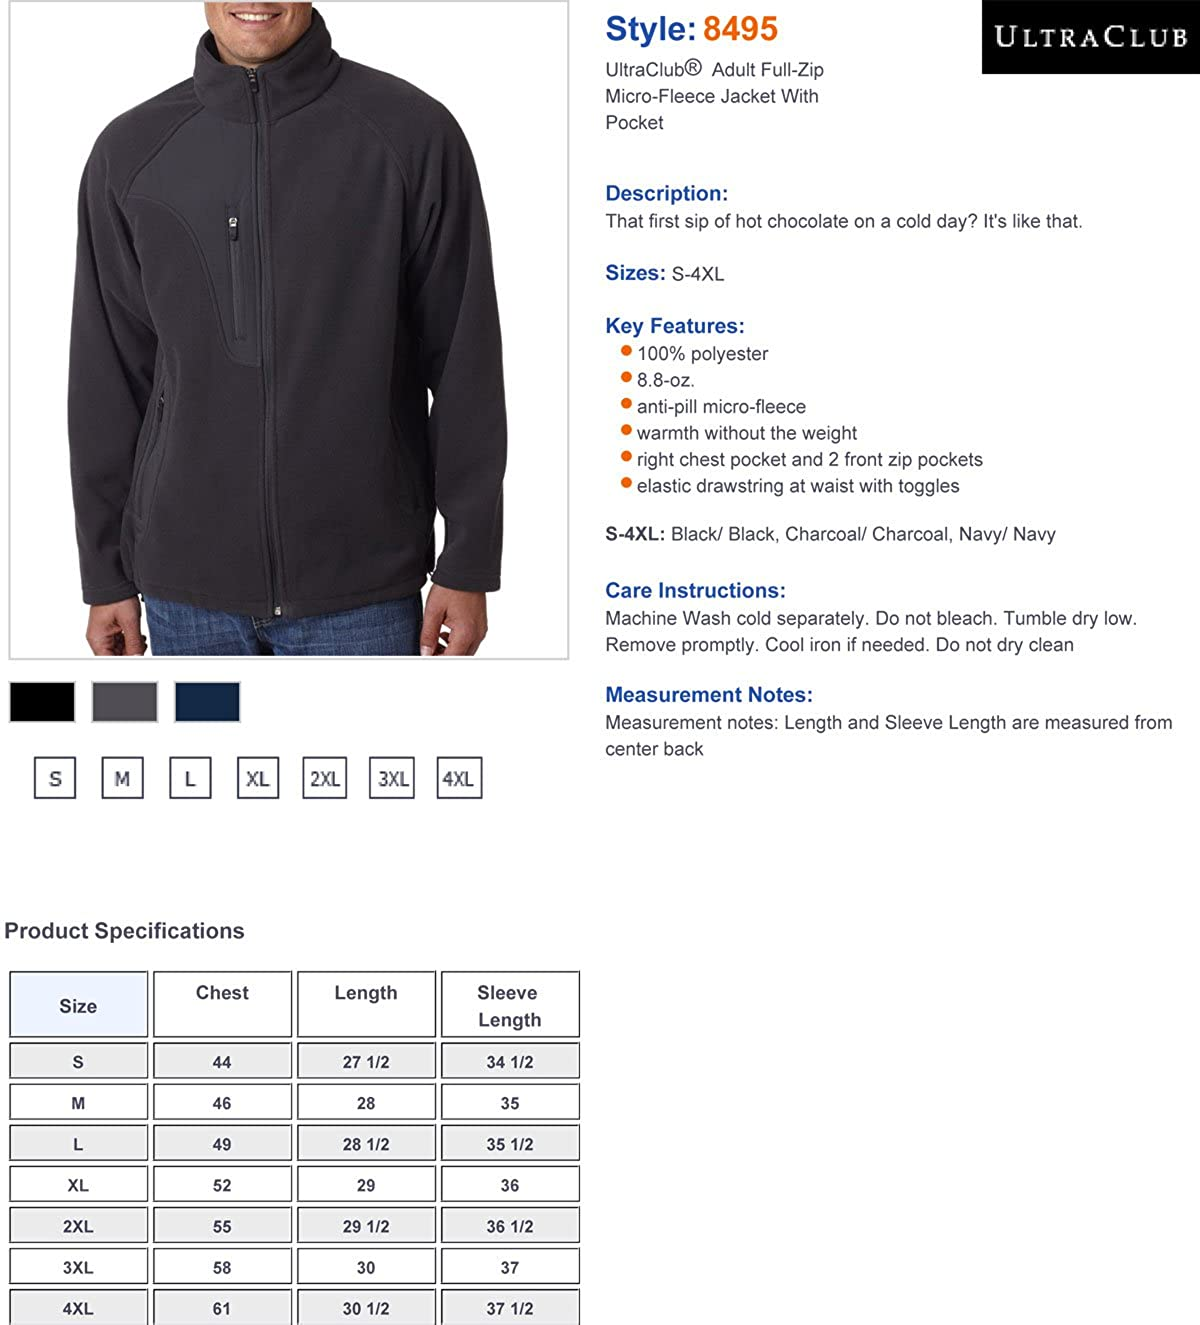 UltraClub/Â Adult Full-Zip Micro-Fleece Jacket With Pocket 8495